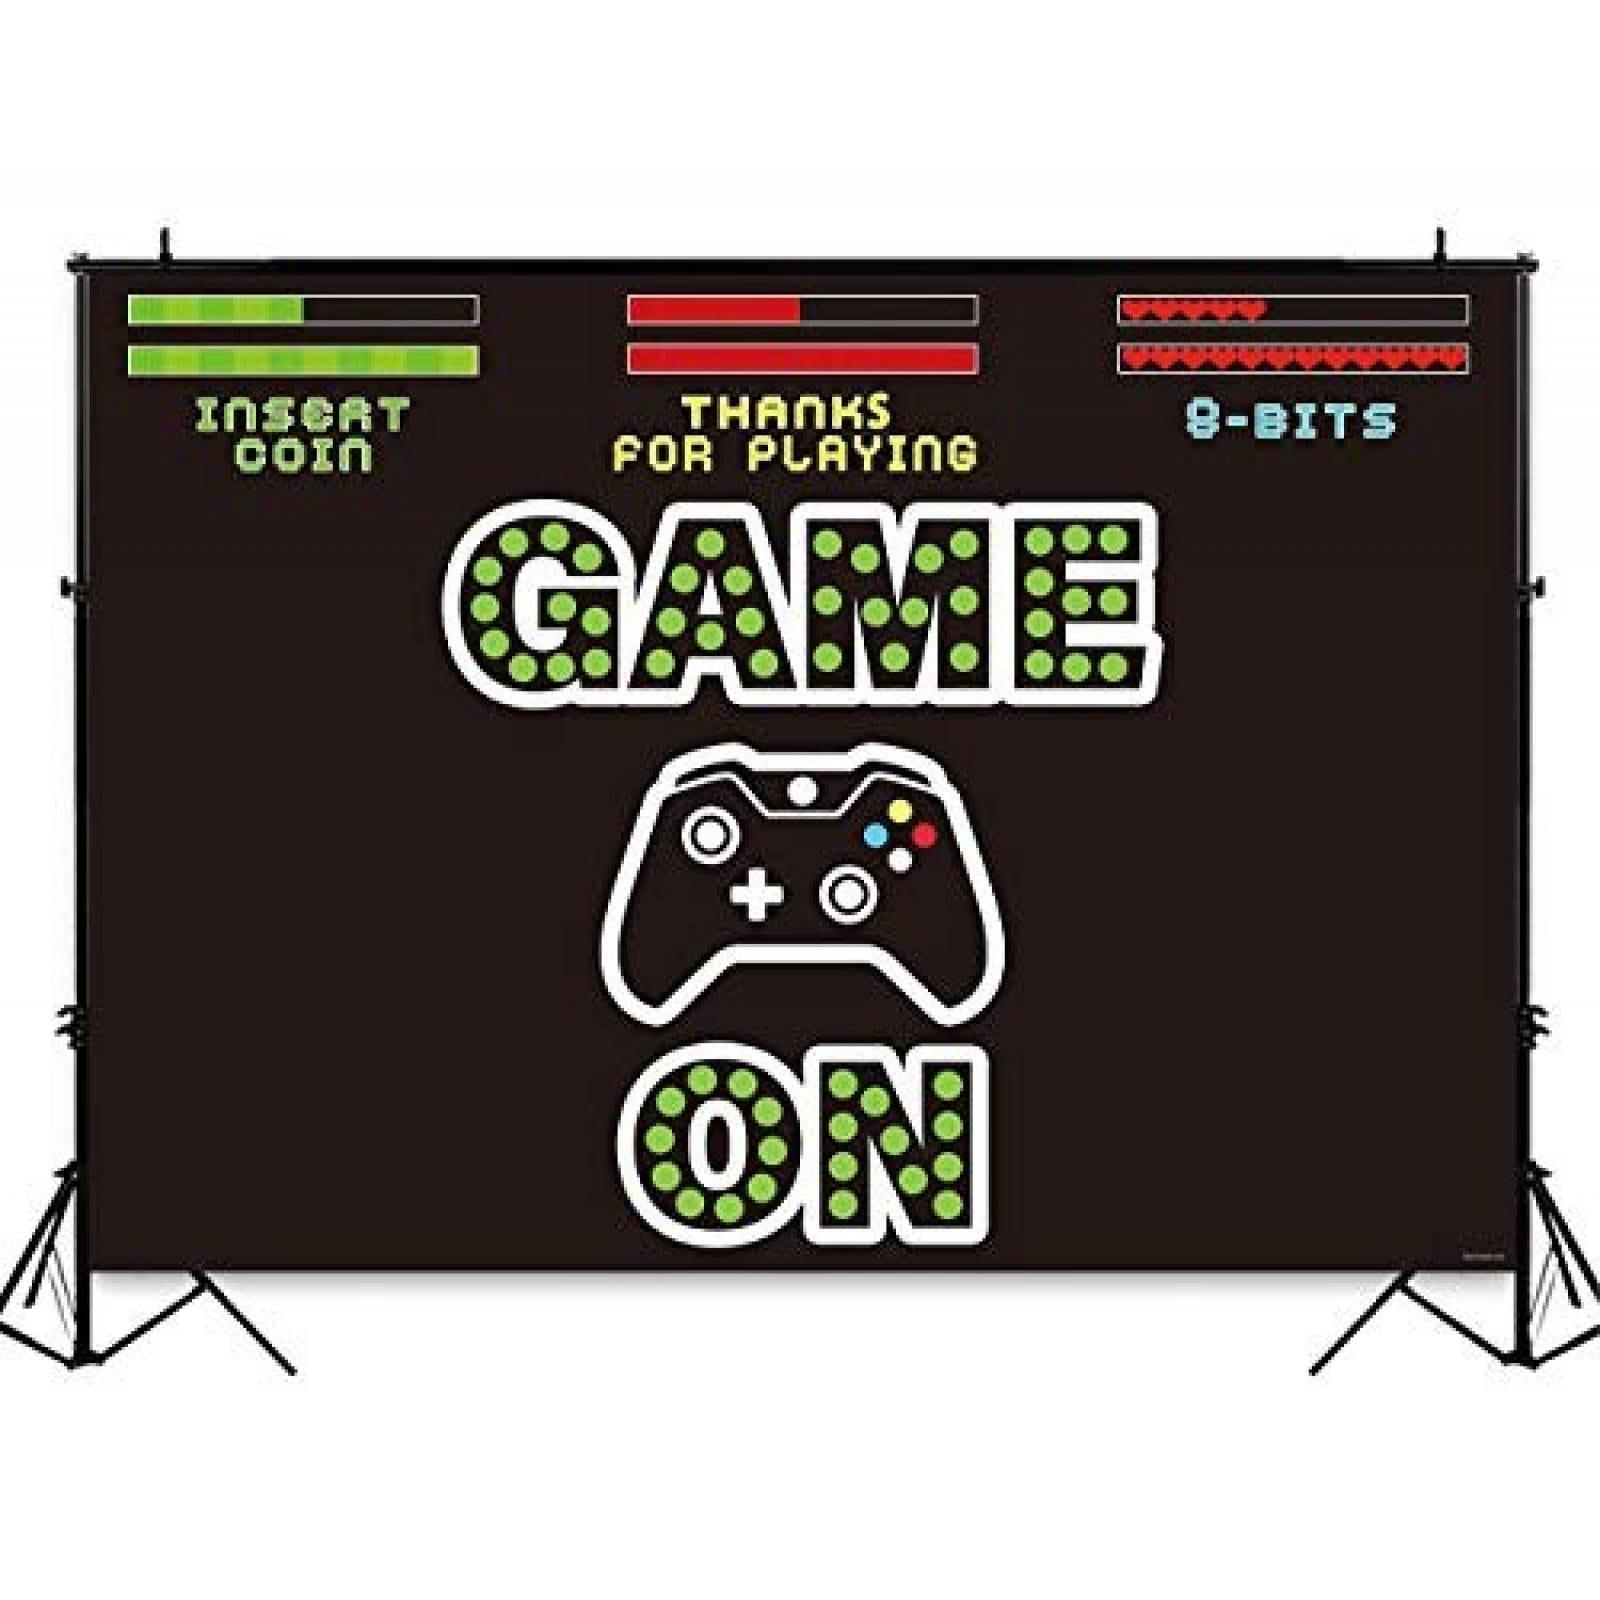 Fondo para eventos Funnytree control de videojuegos -negro